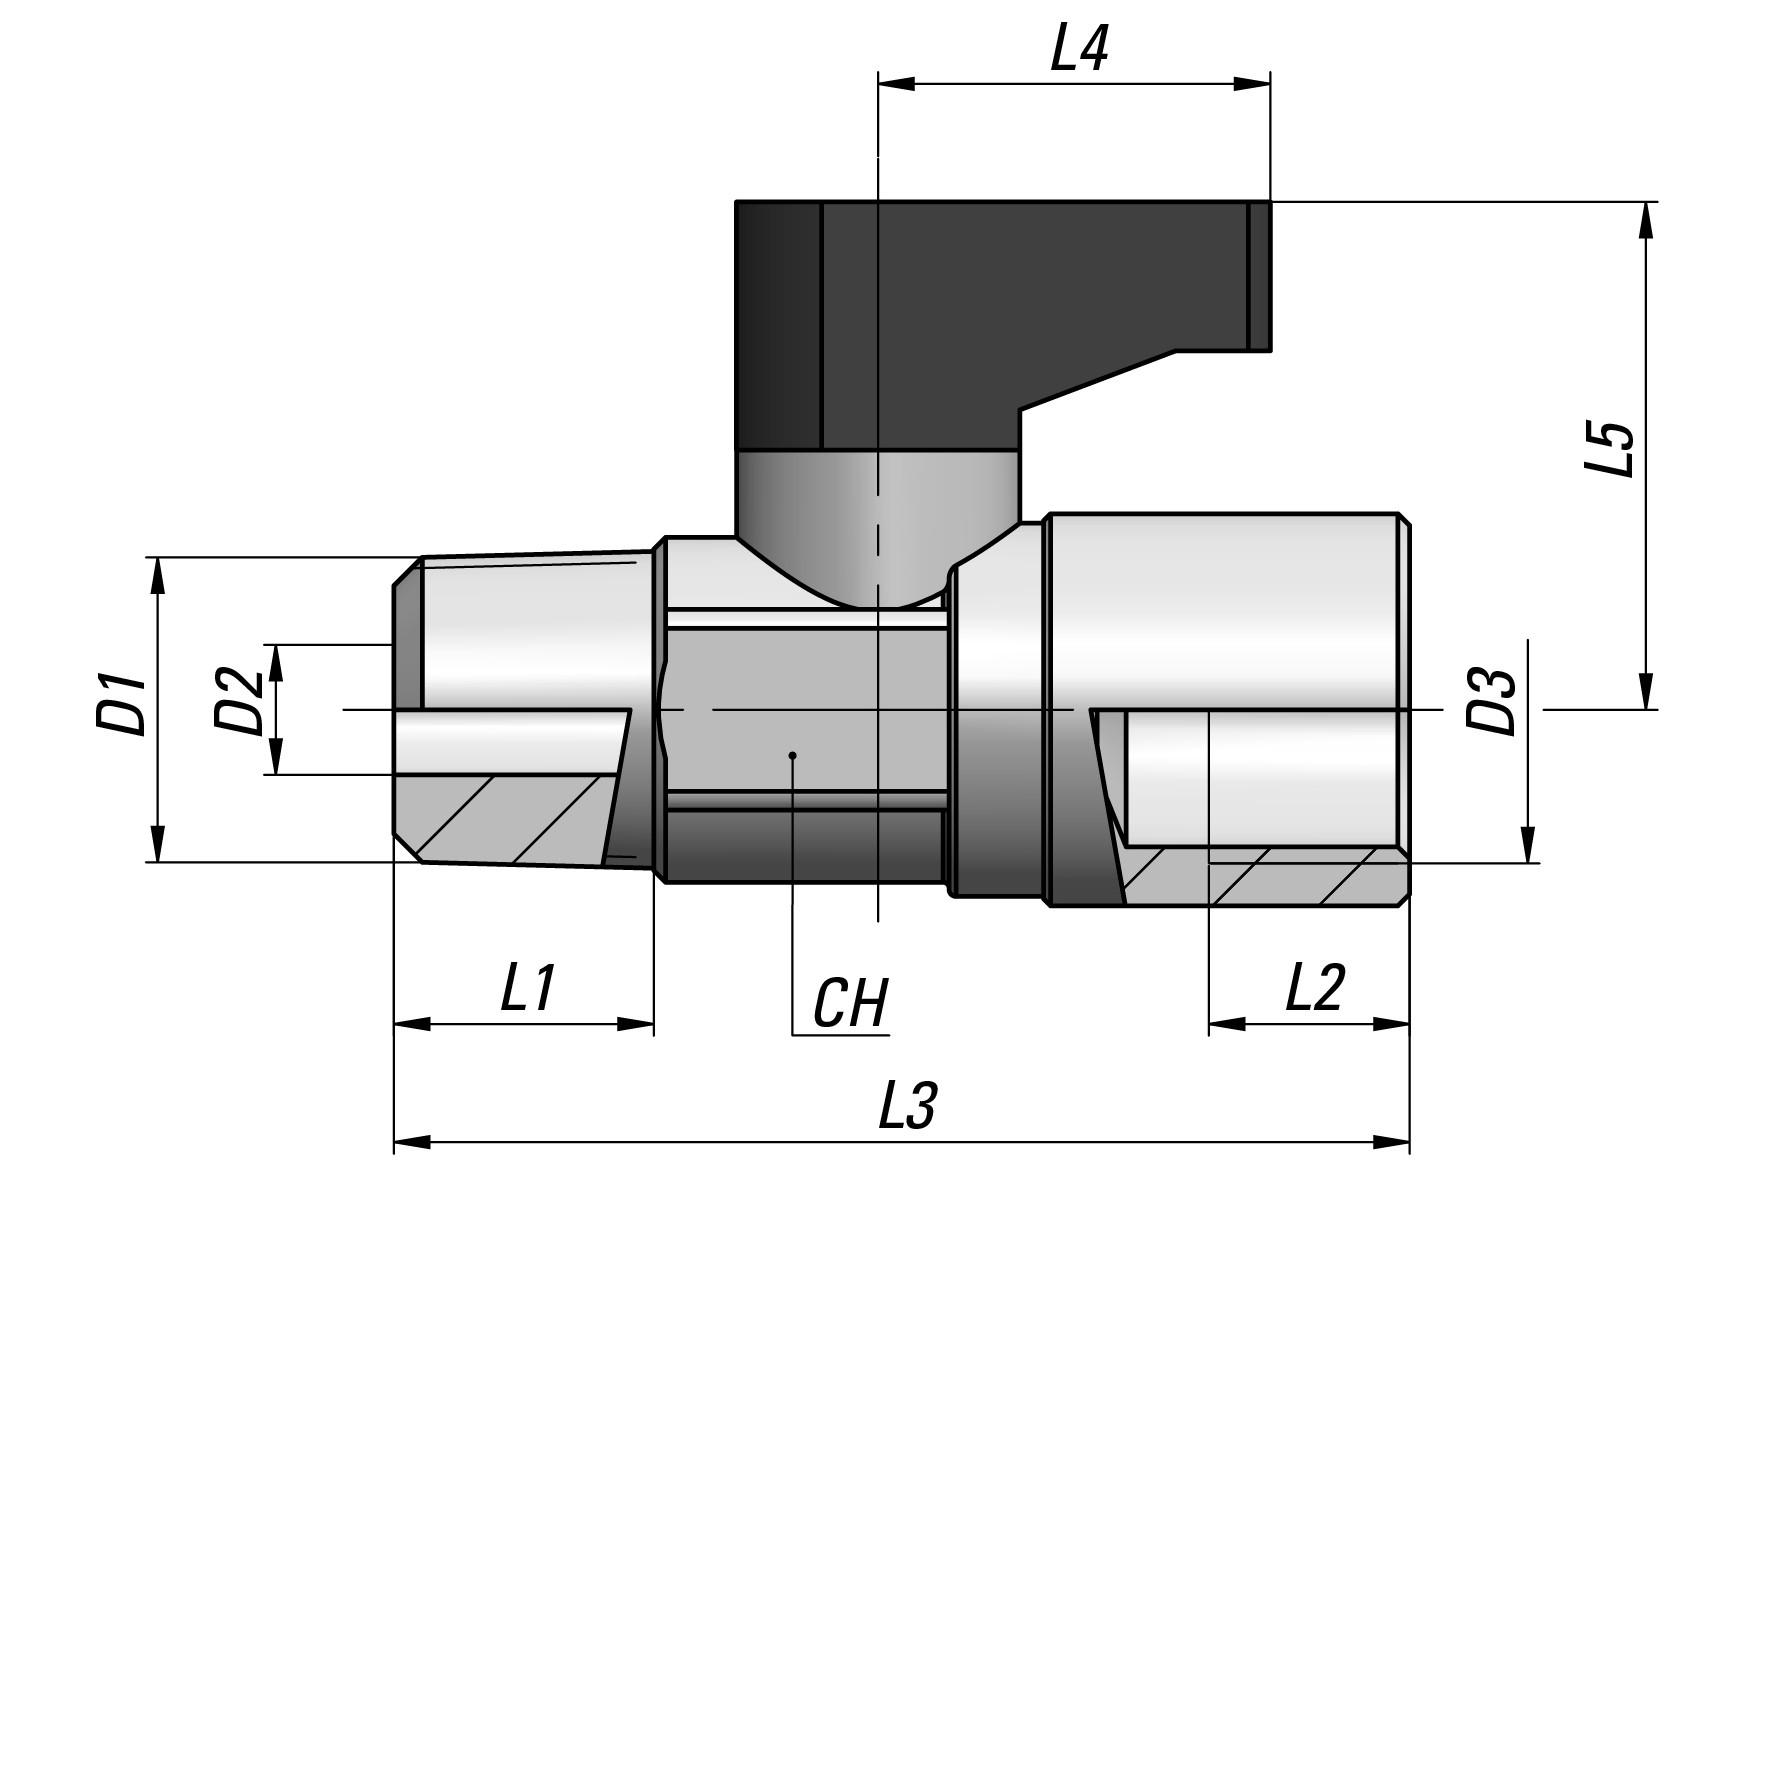 MV54 00 38